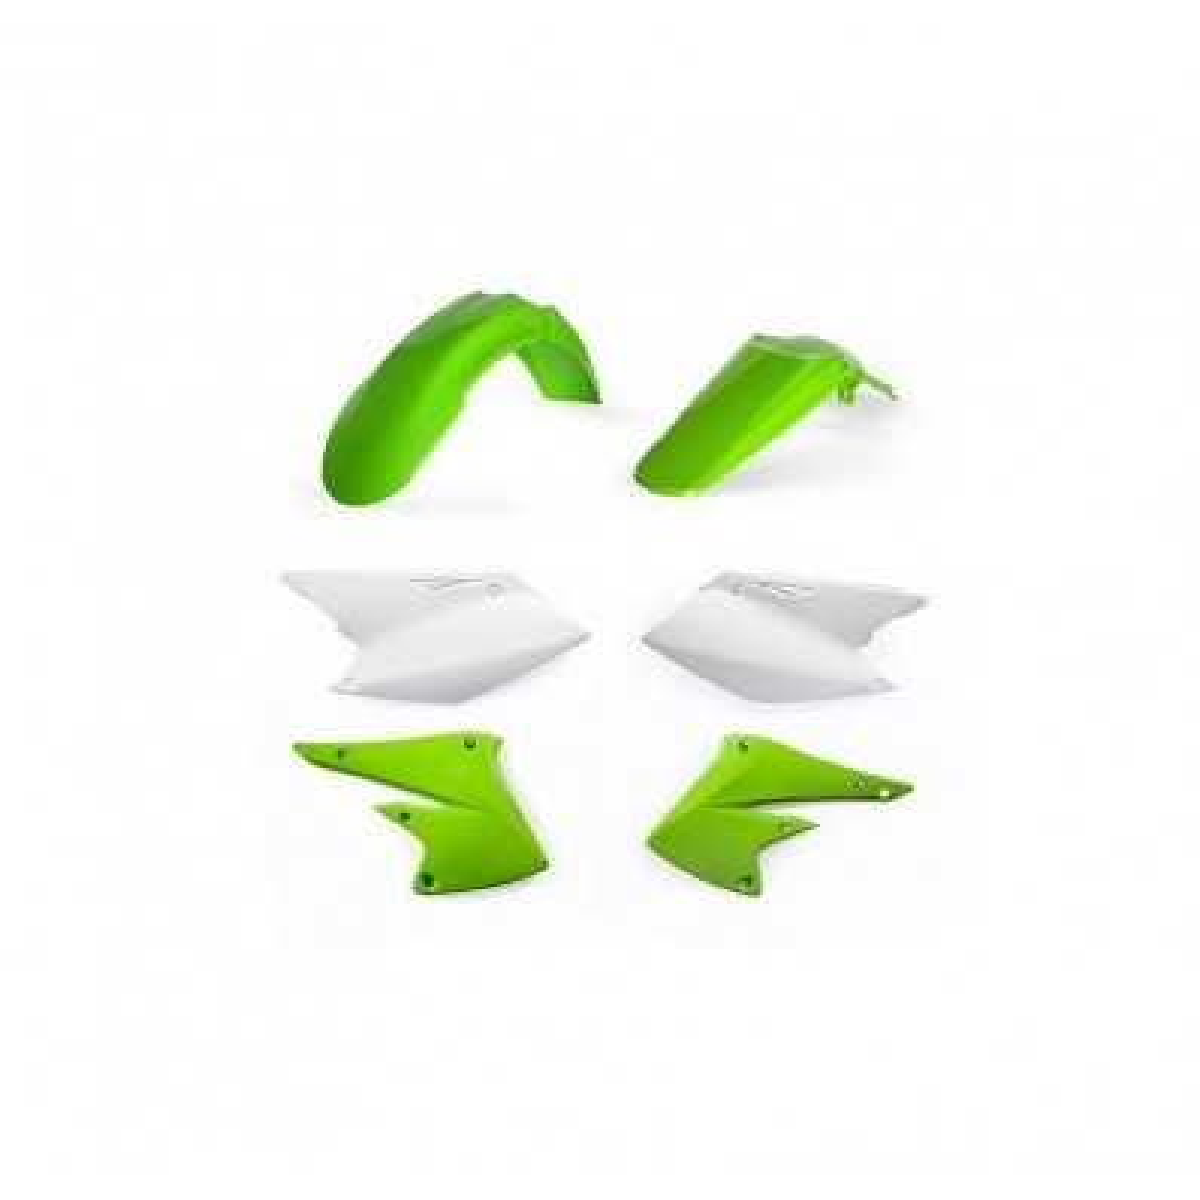 0021842-130 - Kit Plasticos Kxf 450 16 17 Verde